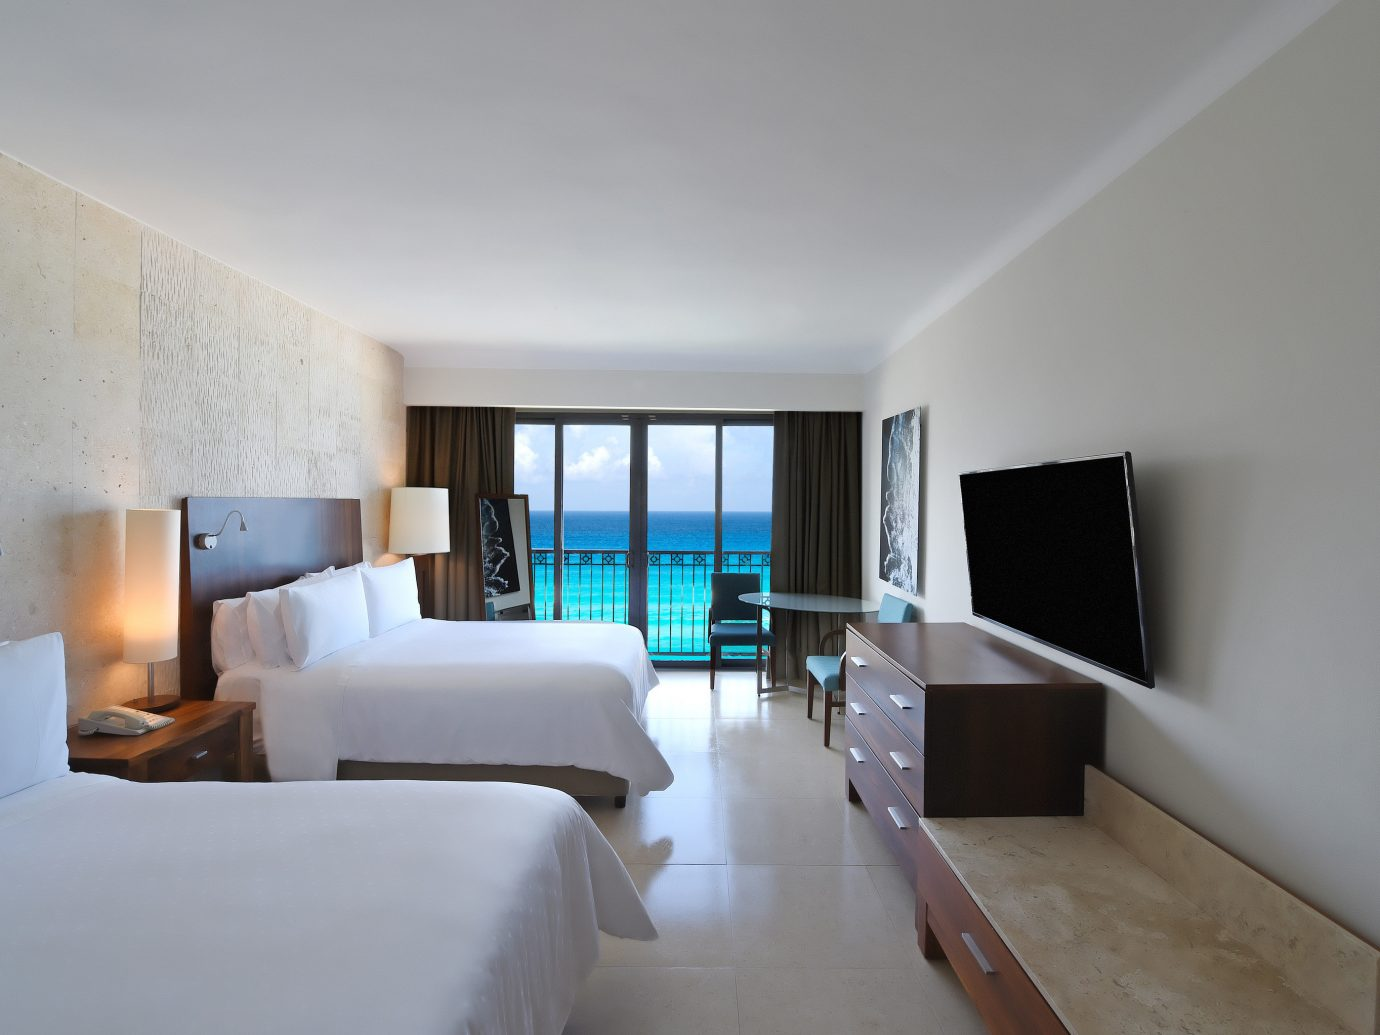 bedroom at Fiesta Americana Condesa Cancun